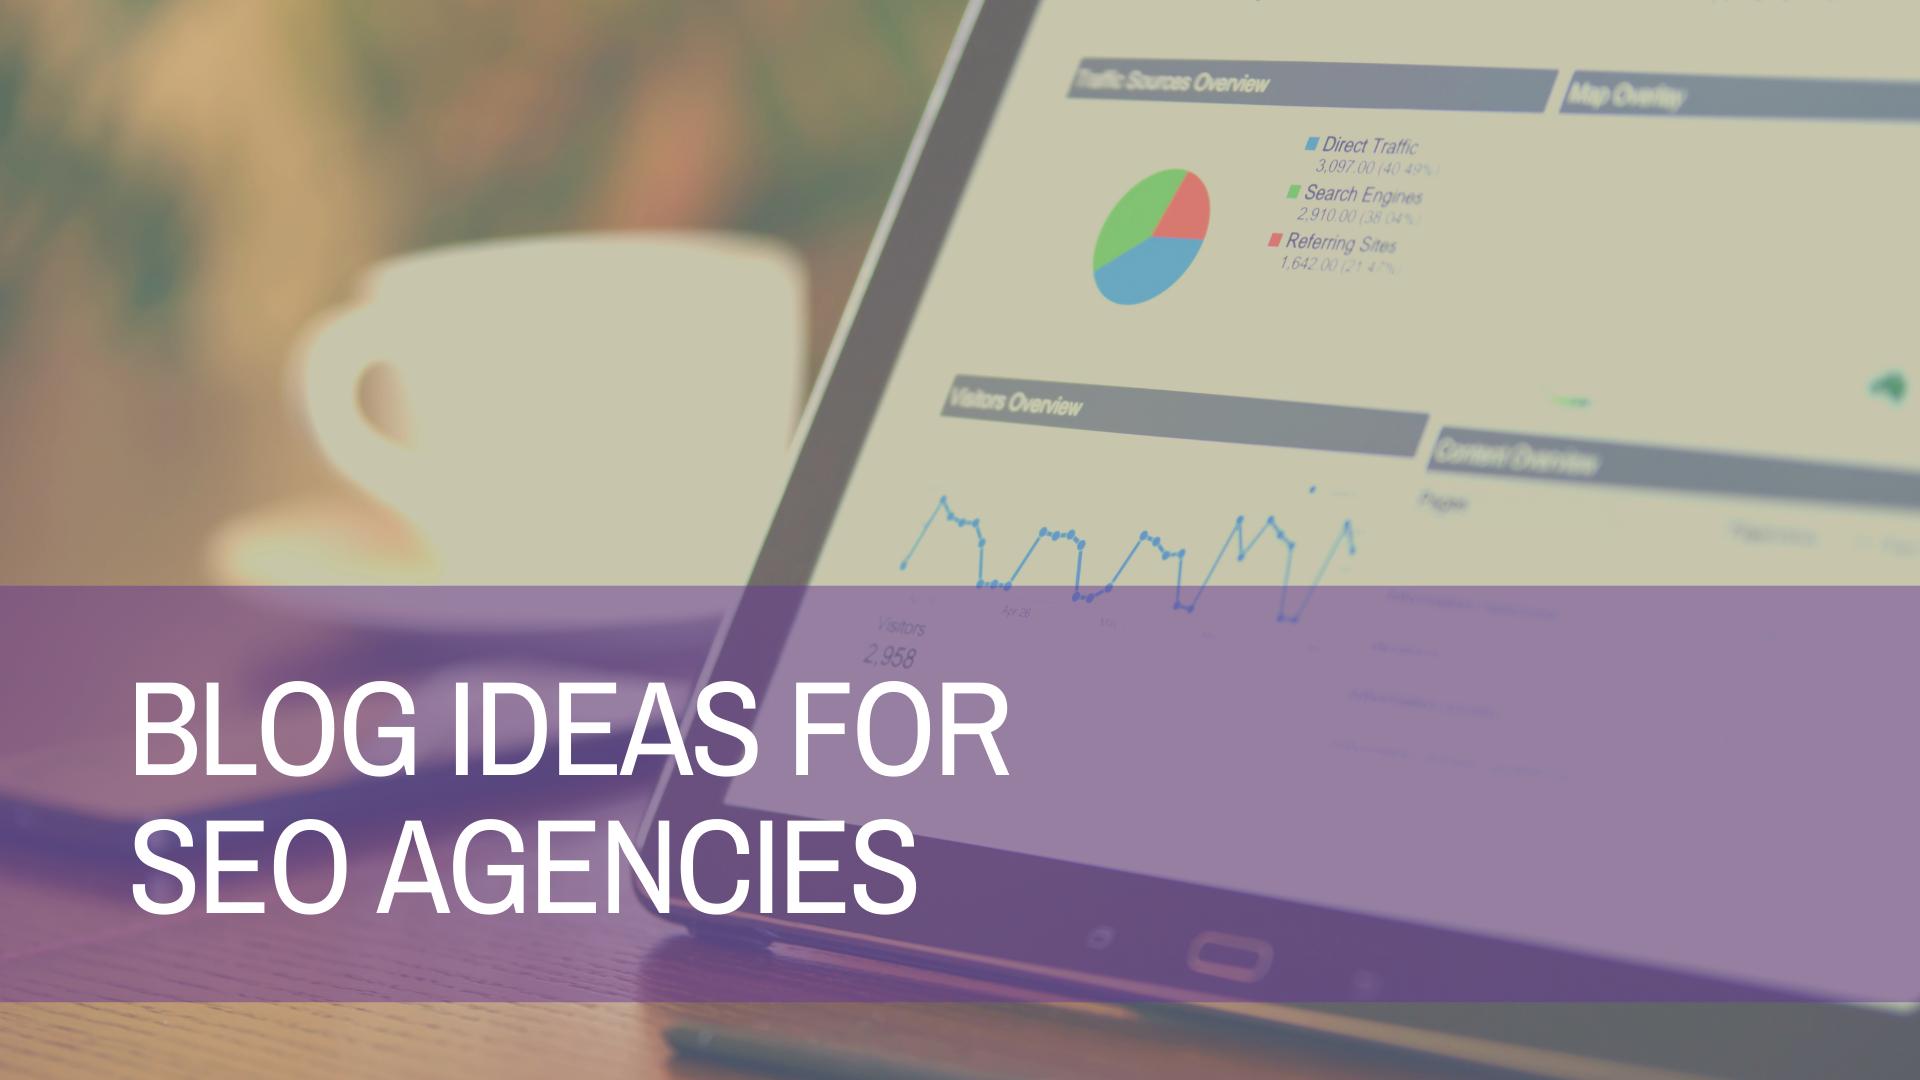 Blog Ideas For SEO Agencies | Amplihigher Copywriting Agency